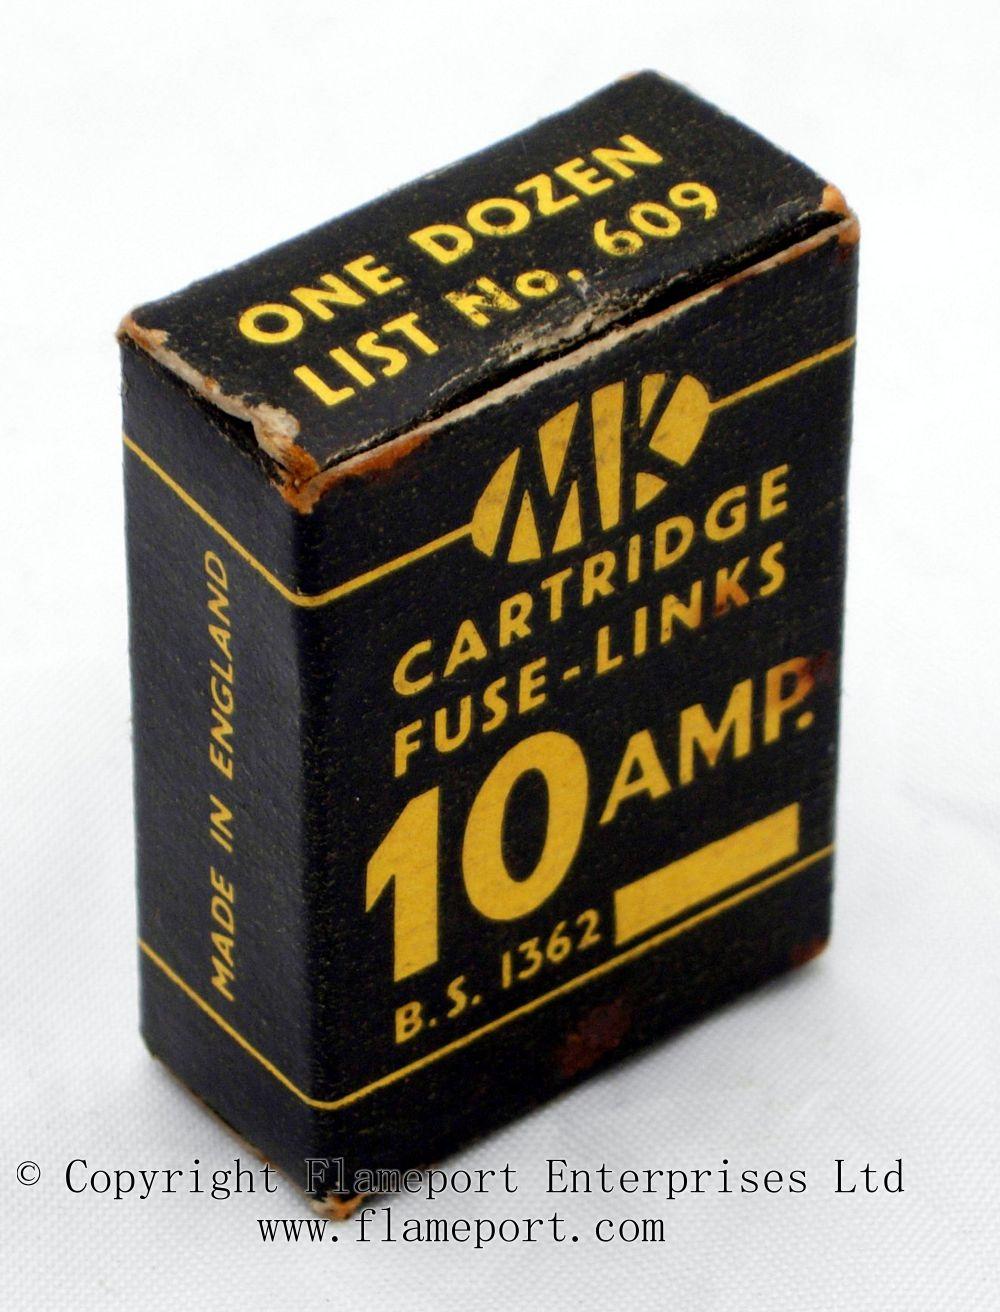 medium resolution of mk cartridge fuse links list no 609 box of one dozen 10 amp fuses